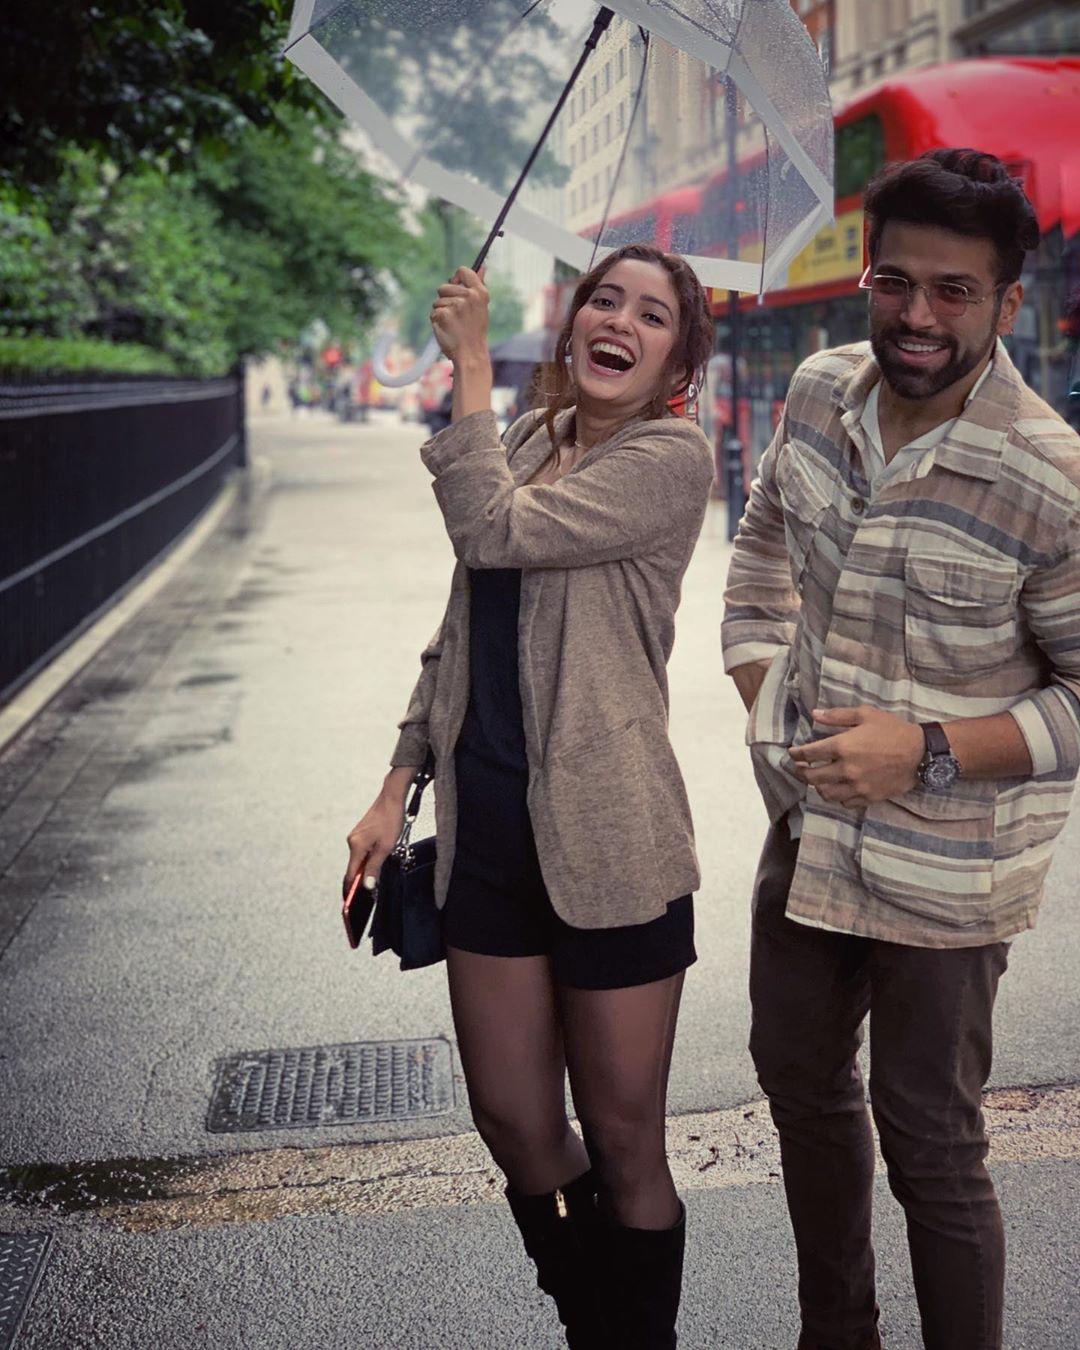 Bollywood Tadka,ऋत्विक धनजानी इमेज,ऋत्विक धनजानी फोटो,ऋत्विक धनजानी पिक्चर, आशा नेगी इमेज,आशा नेगी फोटो,आशा नेगी पिक्चर,